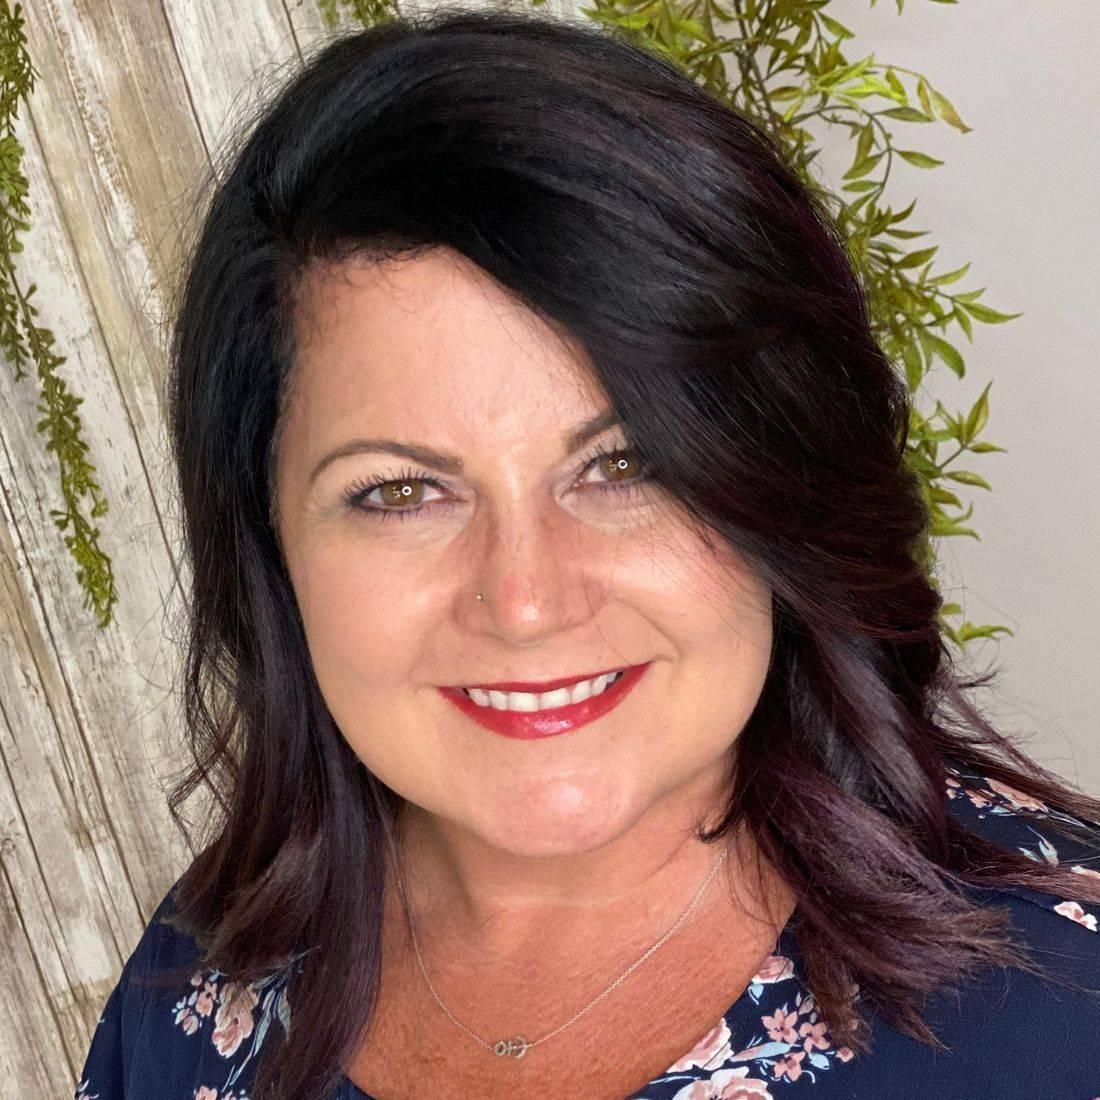 Master Cosmetologist Melissa Mast